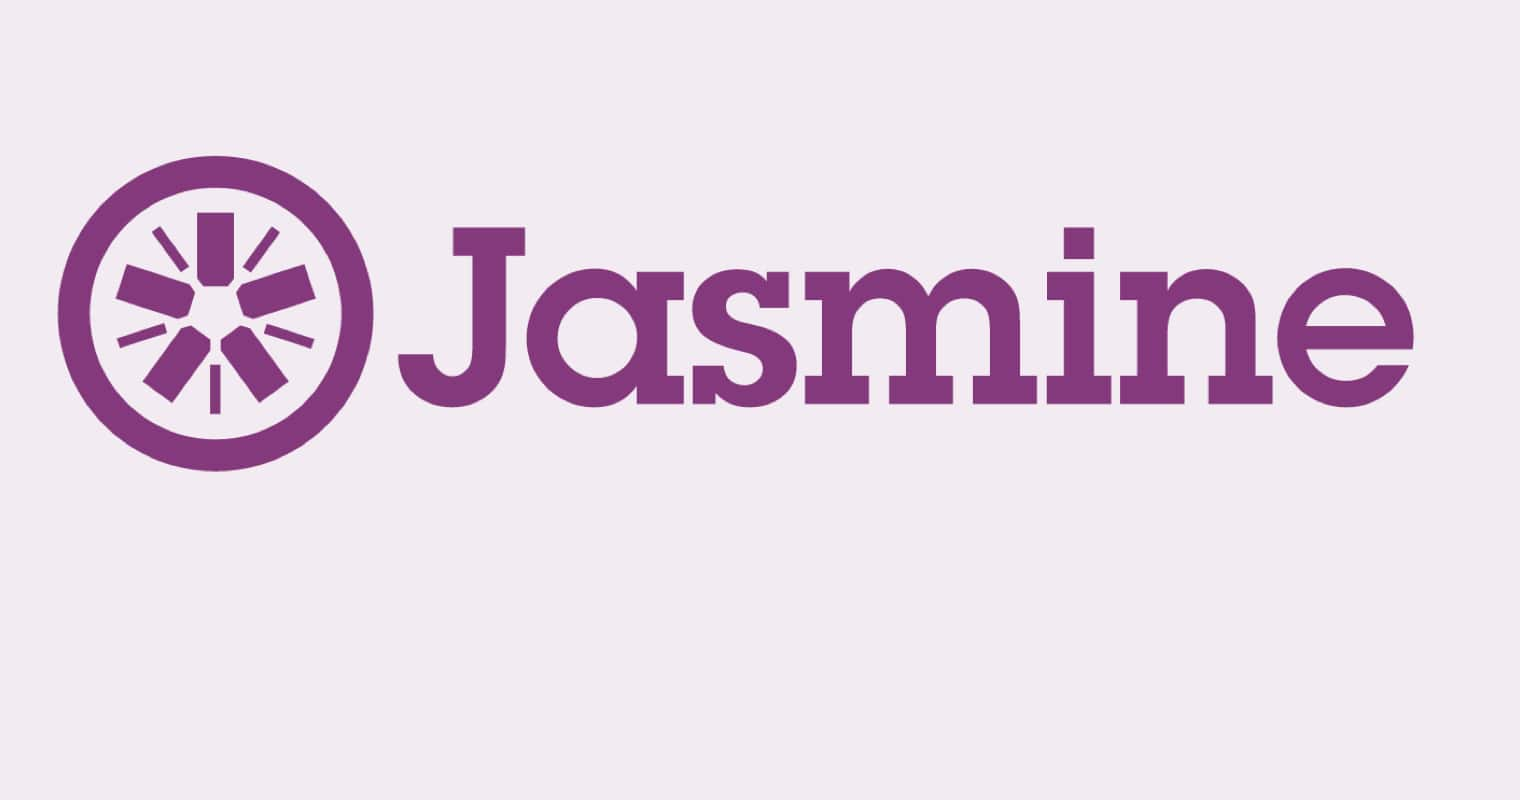 jasmine - Javascript testing framework